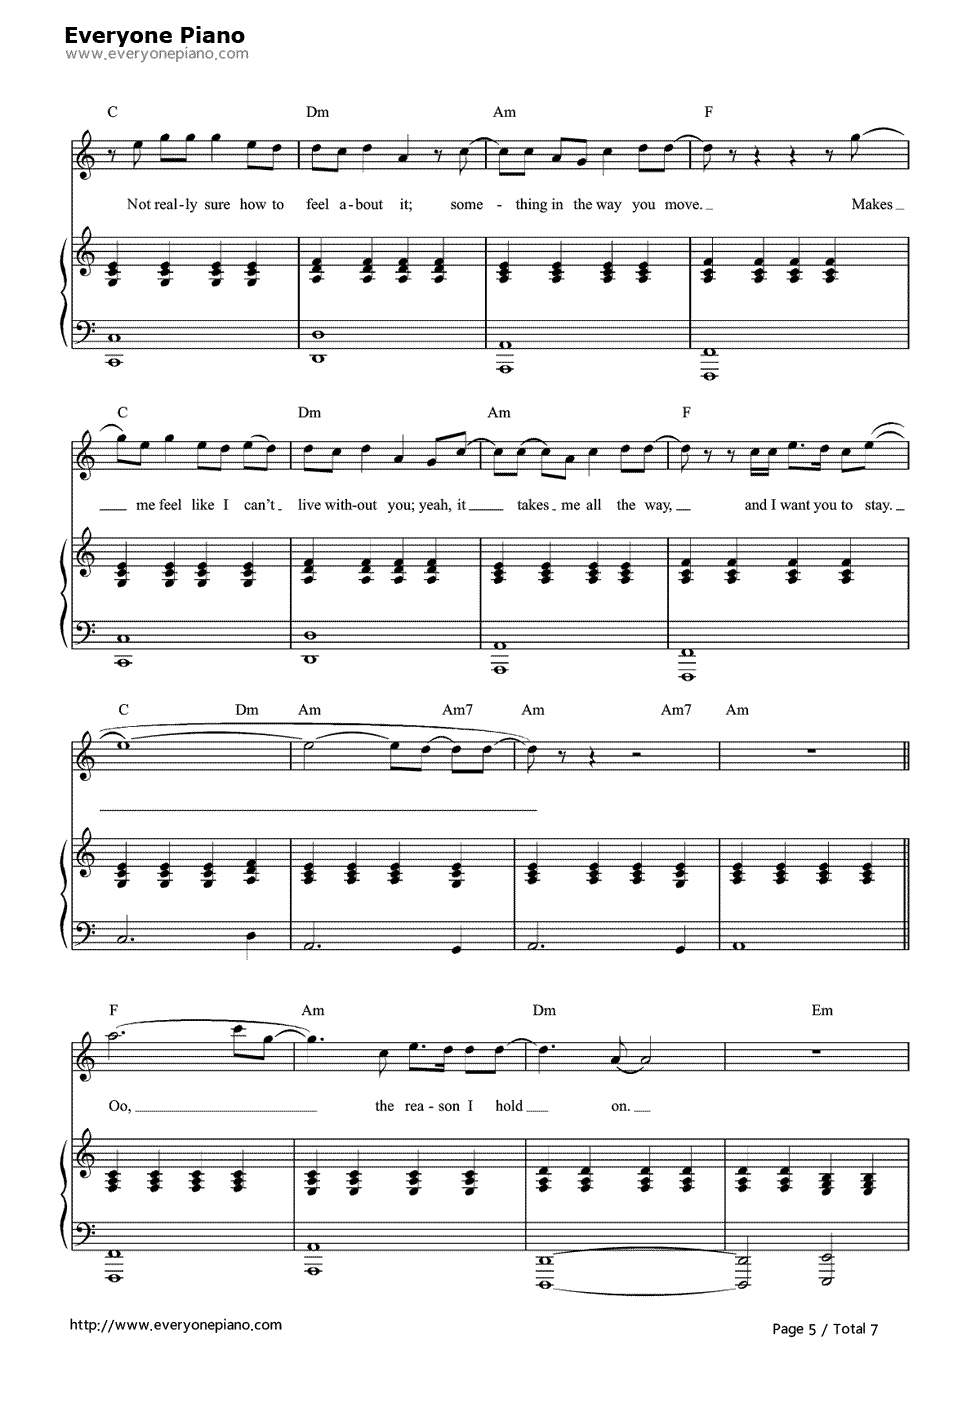 Free stay rihanna and mikky ekko sheet music preview 5 page 5 free stay rihanna and mikky ekko sheet music preview 5 page 5 hexwebz Choice Image